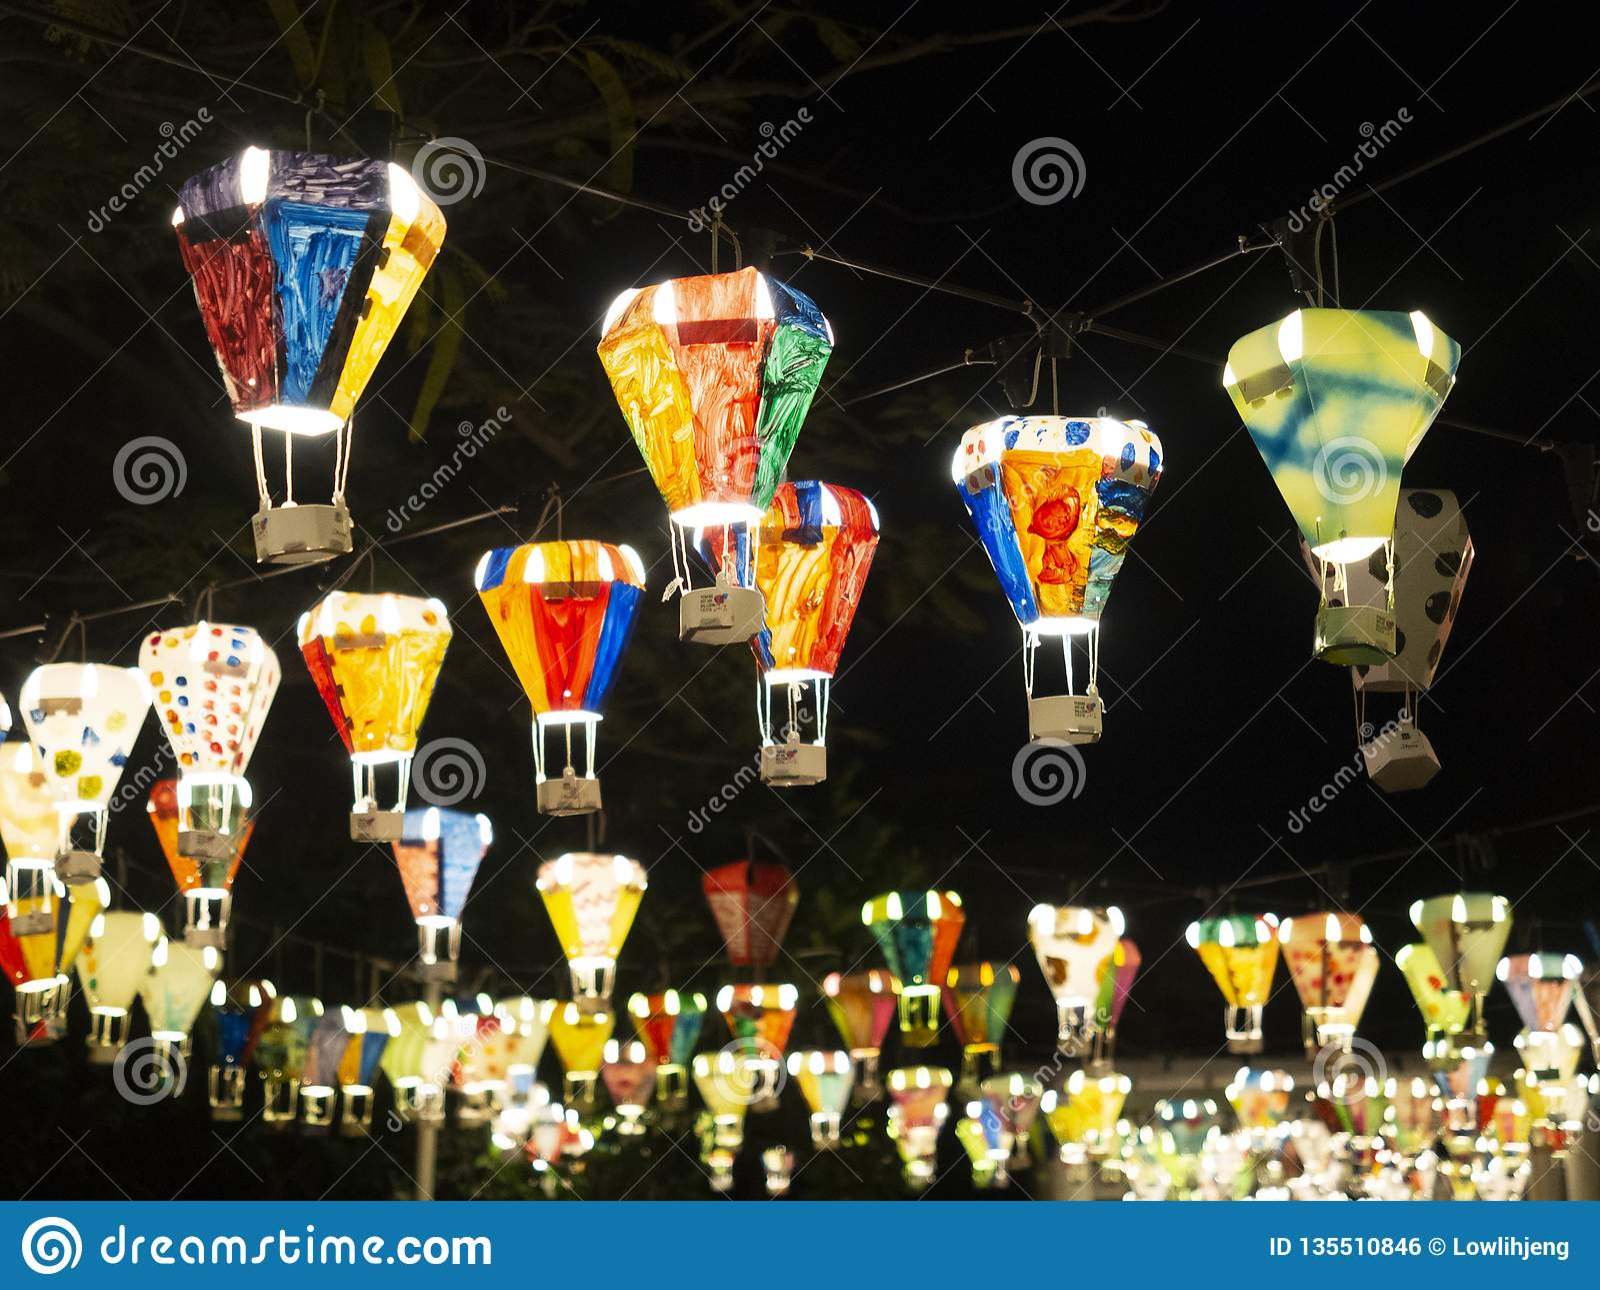 Hot air balloon festival, Lebuh Pantai, Georgetown, Penang